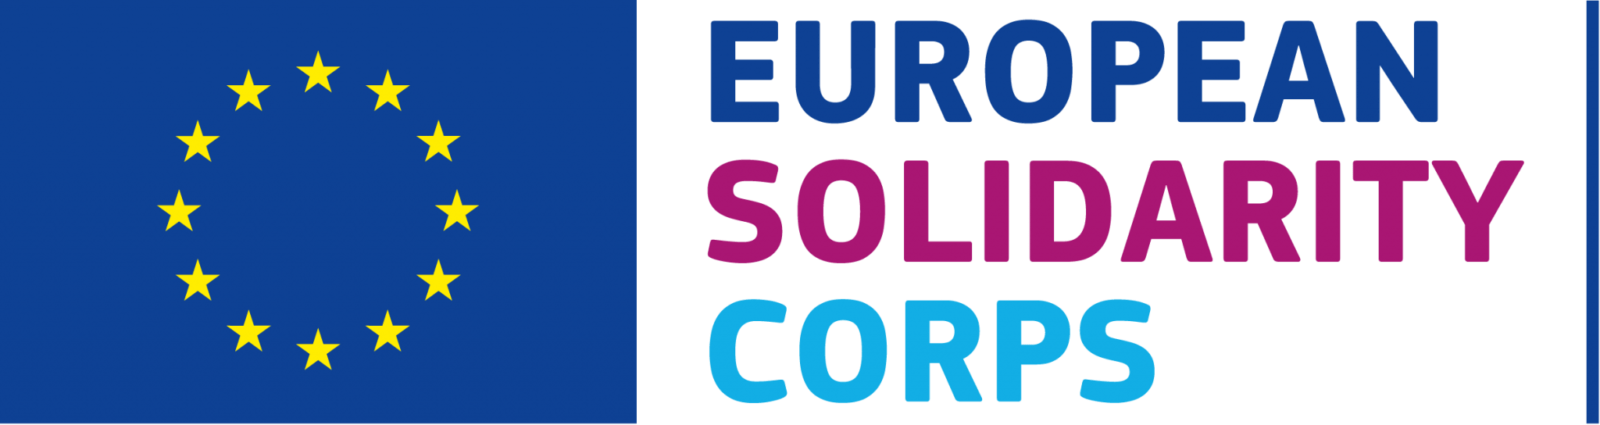 EN European Solidarity Corps LOGO CMYK